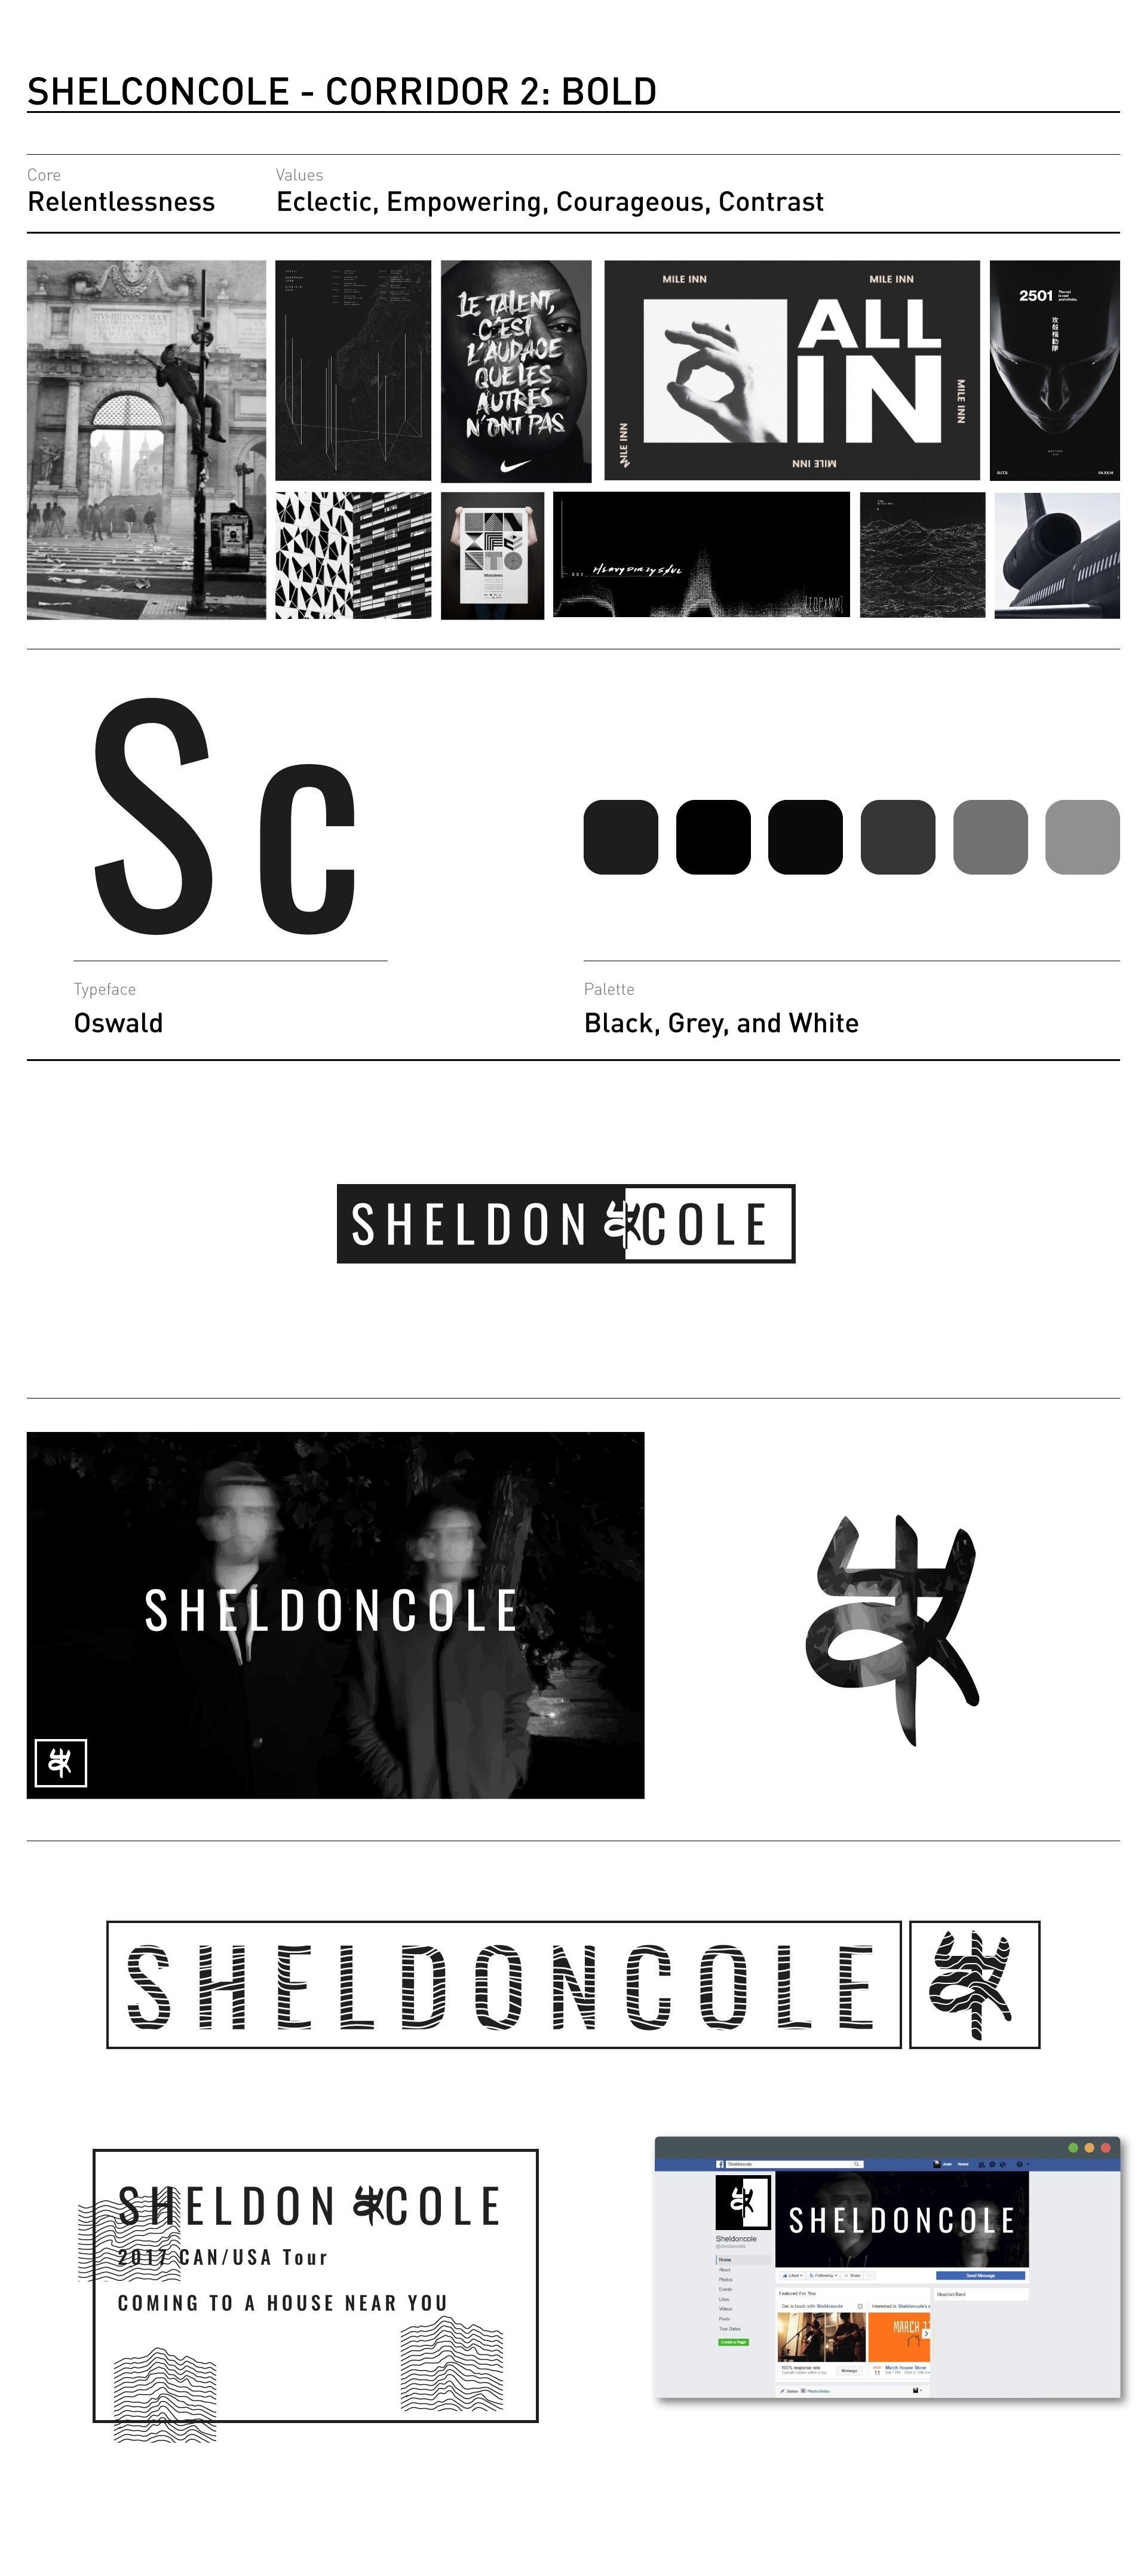 sheldoncole_corridorsB_bold-tiny.png